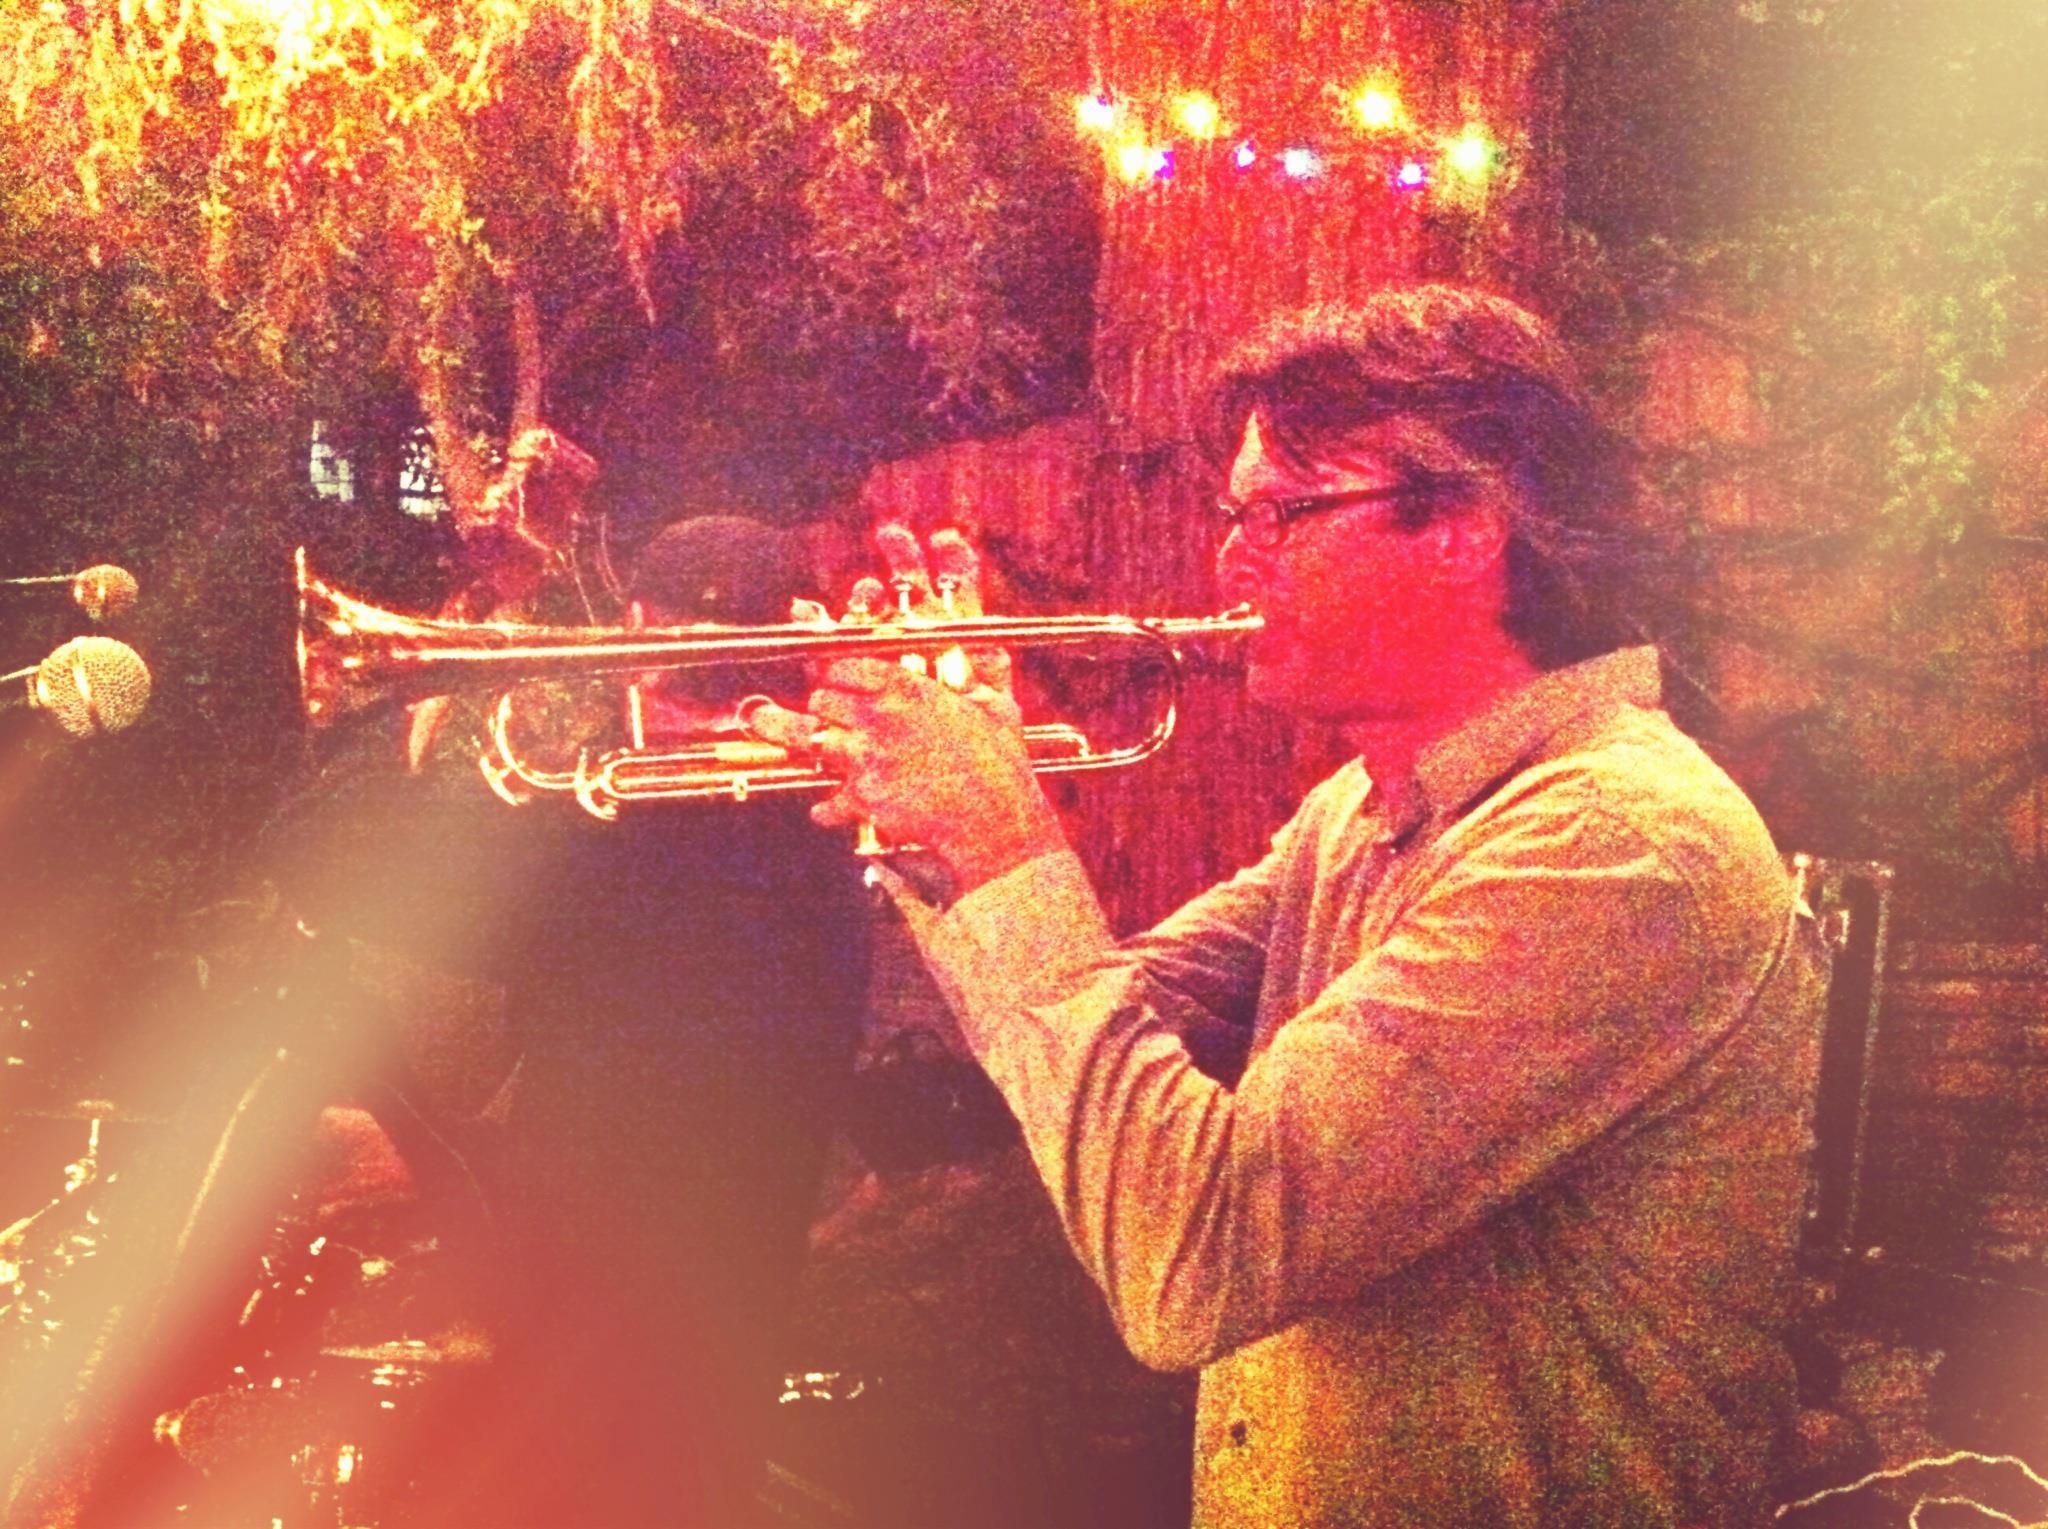 John Harrington @ The Jupiter in Berkeley